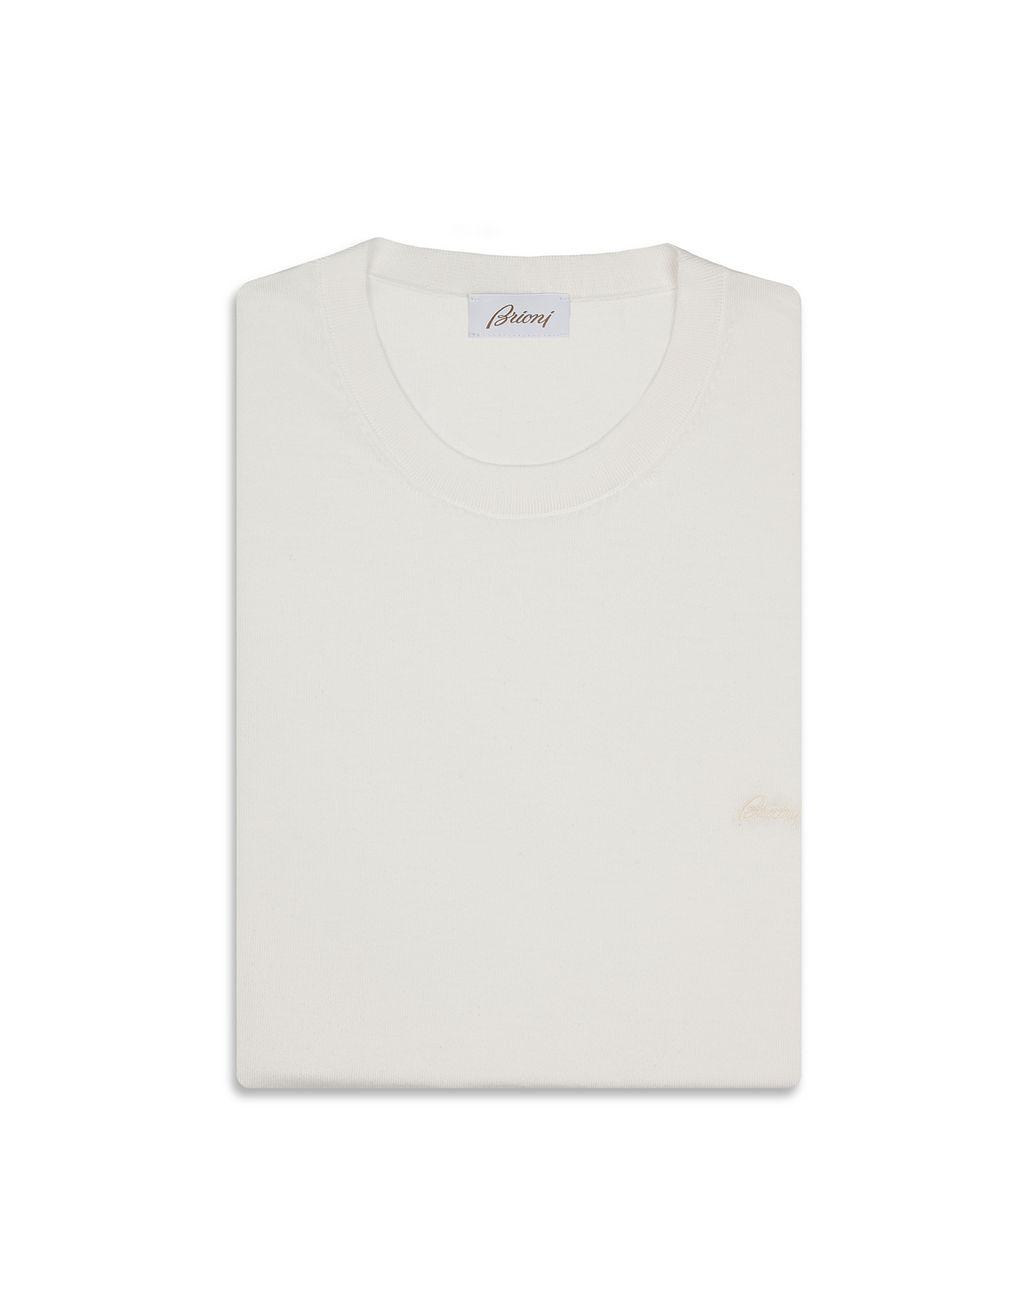 BRIONI White Logoed T-Shirt T-Shirts & Polos Man e